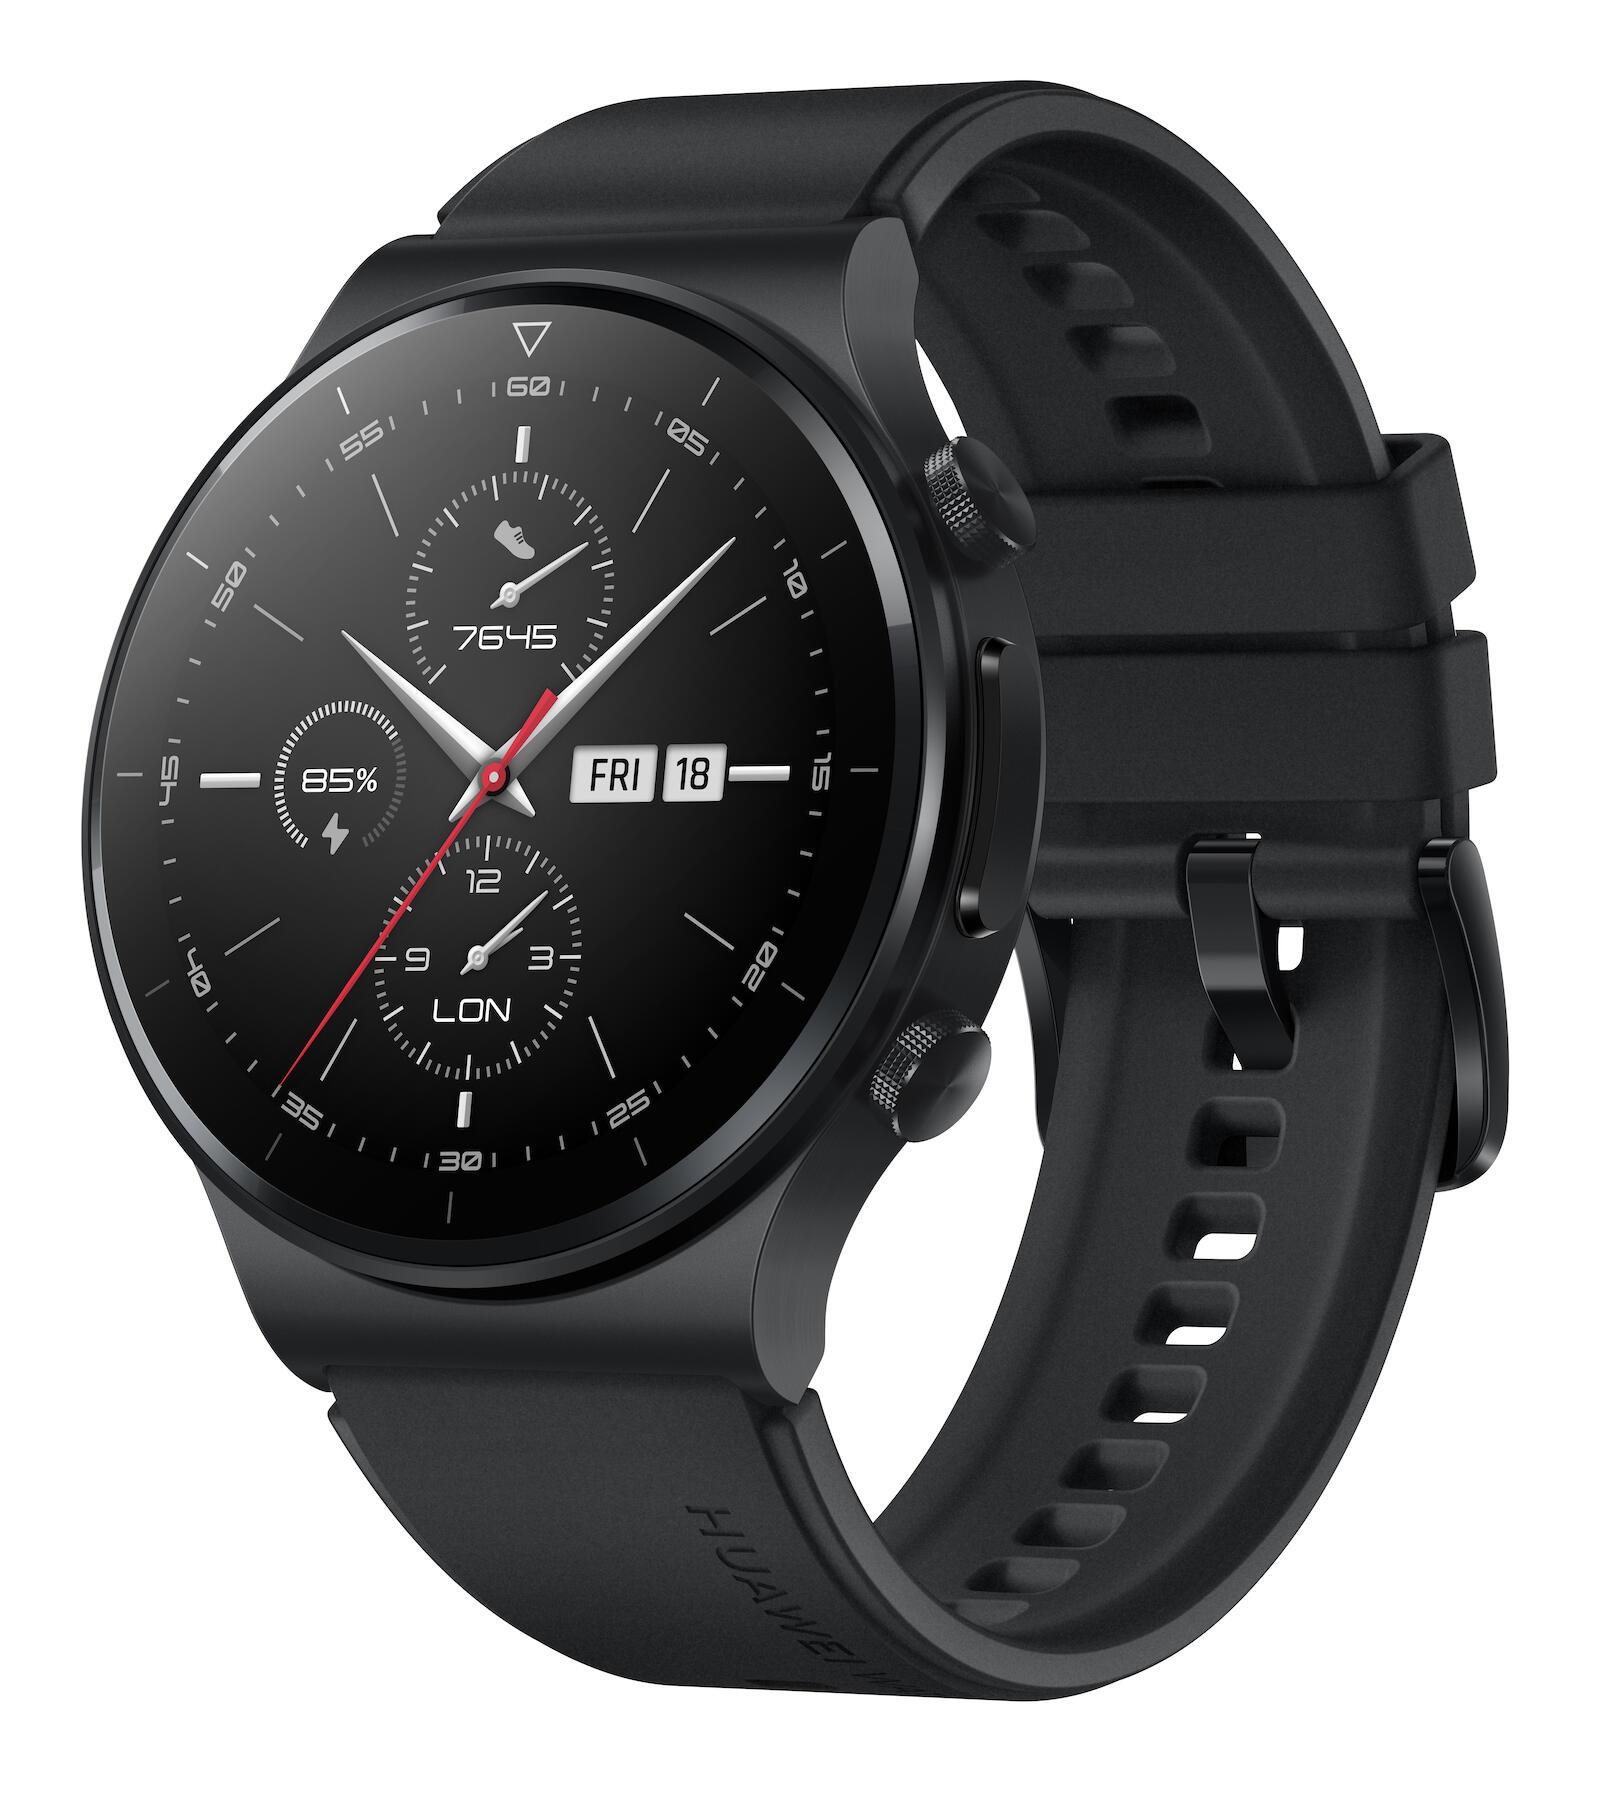 Huawei Watch Gt 2 Pro Porsche Edition